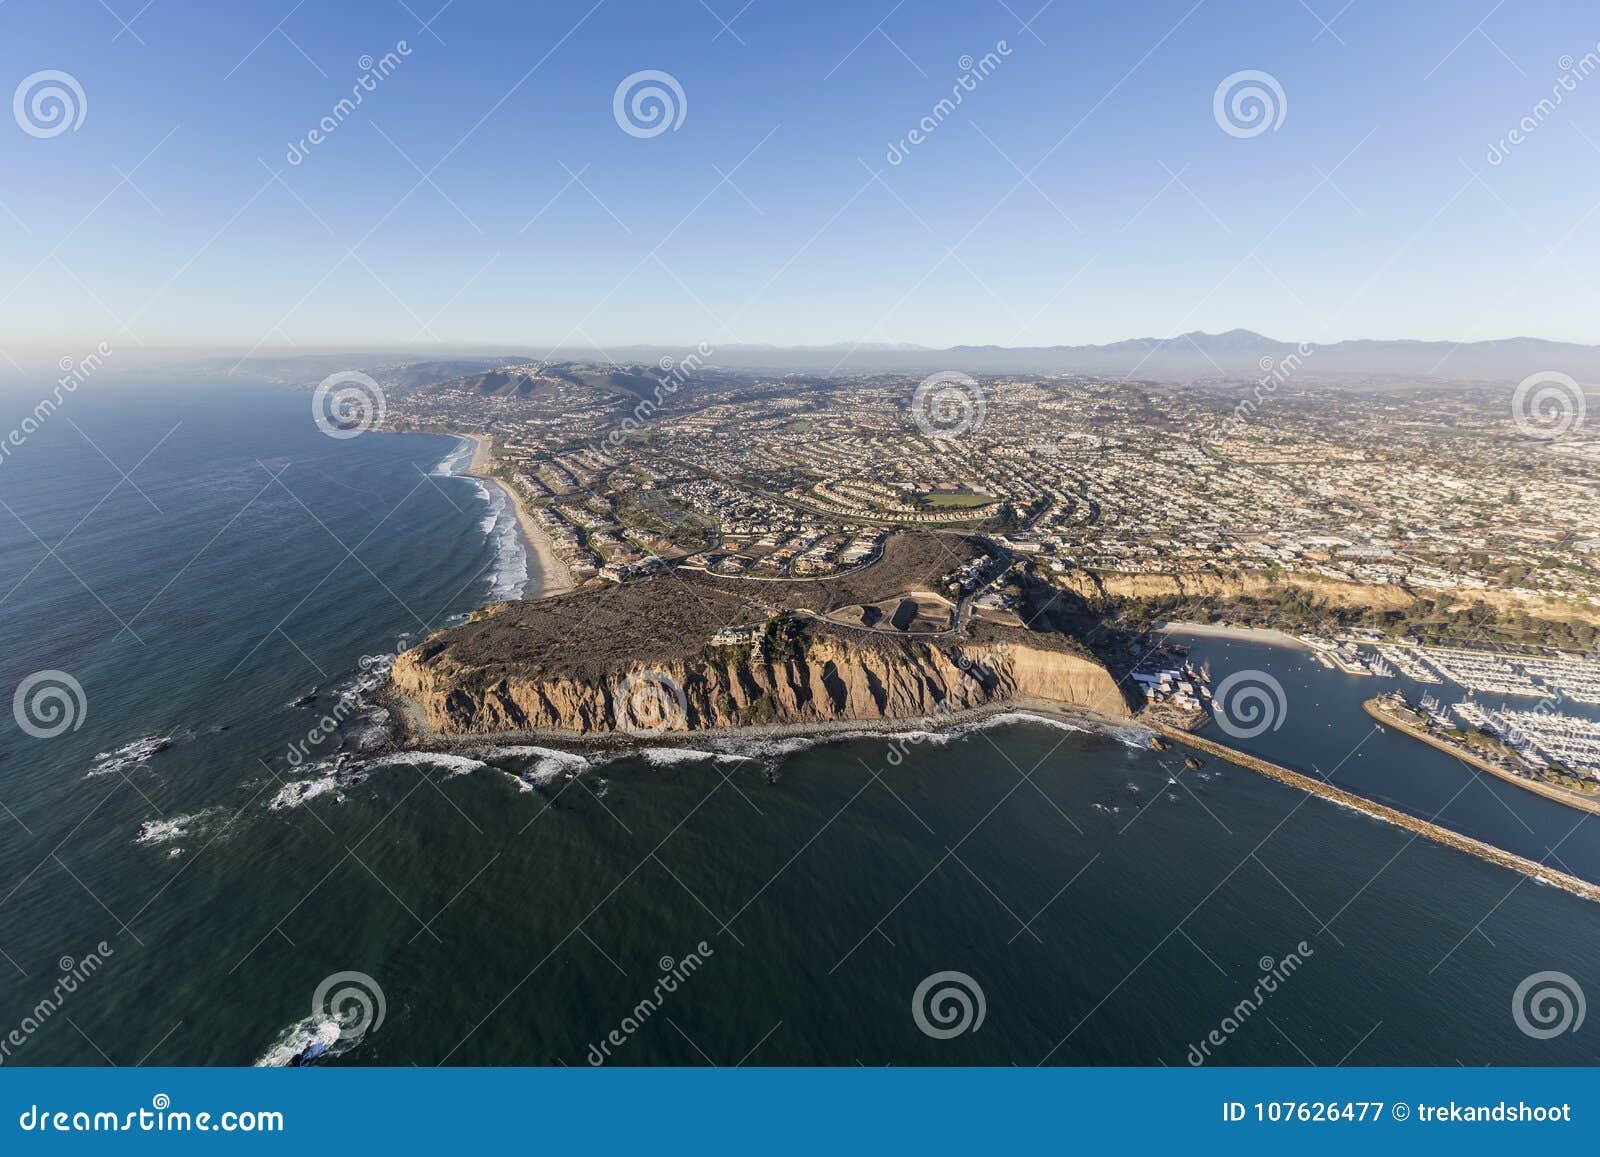 Dana Point California Aerial